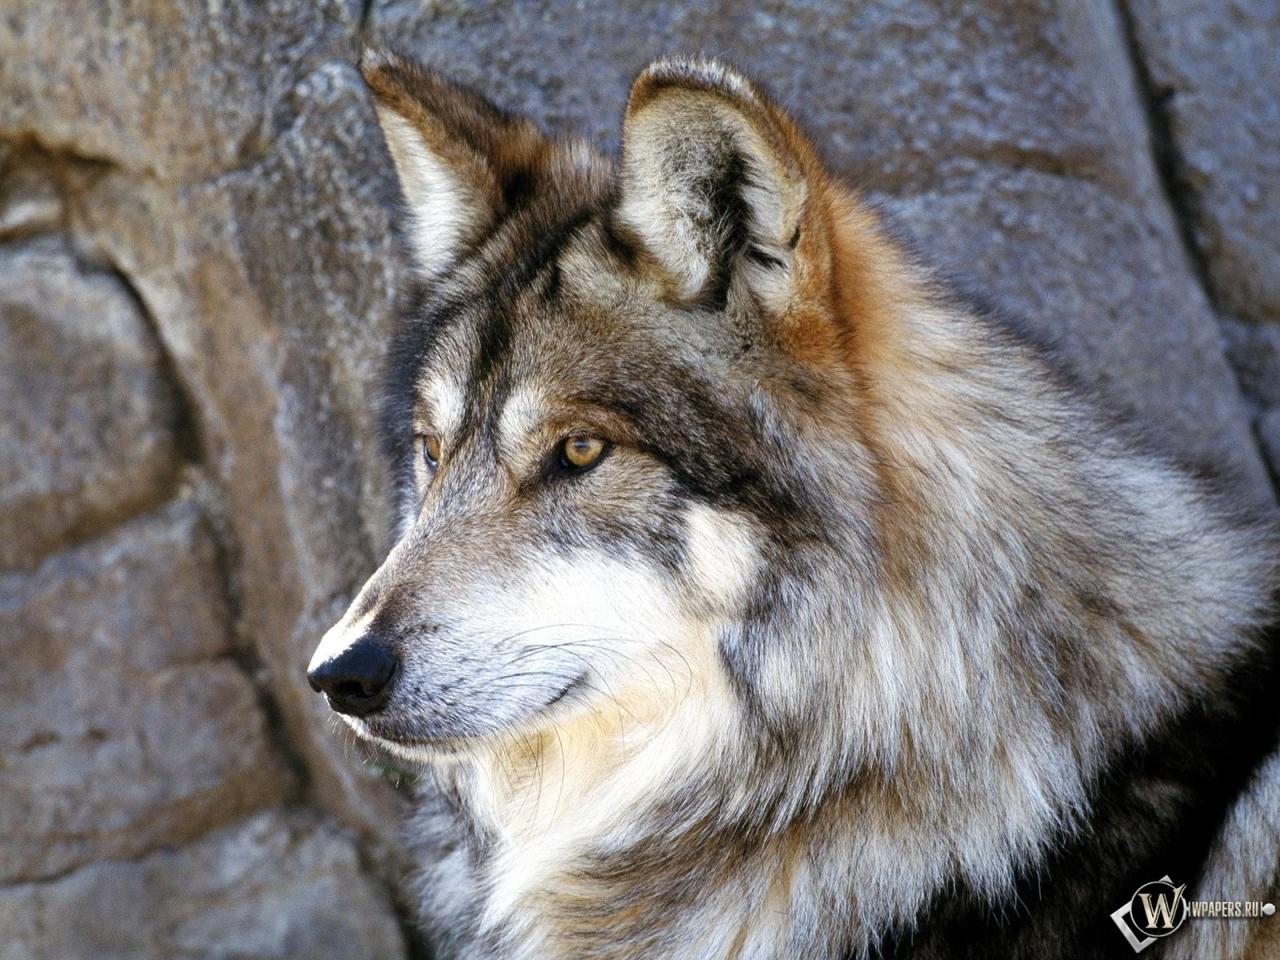 ... волк Фото, Волк, Голова на рабочий стол: wpapers.ru/wallpapers/animals/Wolfs/4545/1280-960_Красивый...